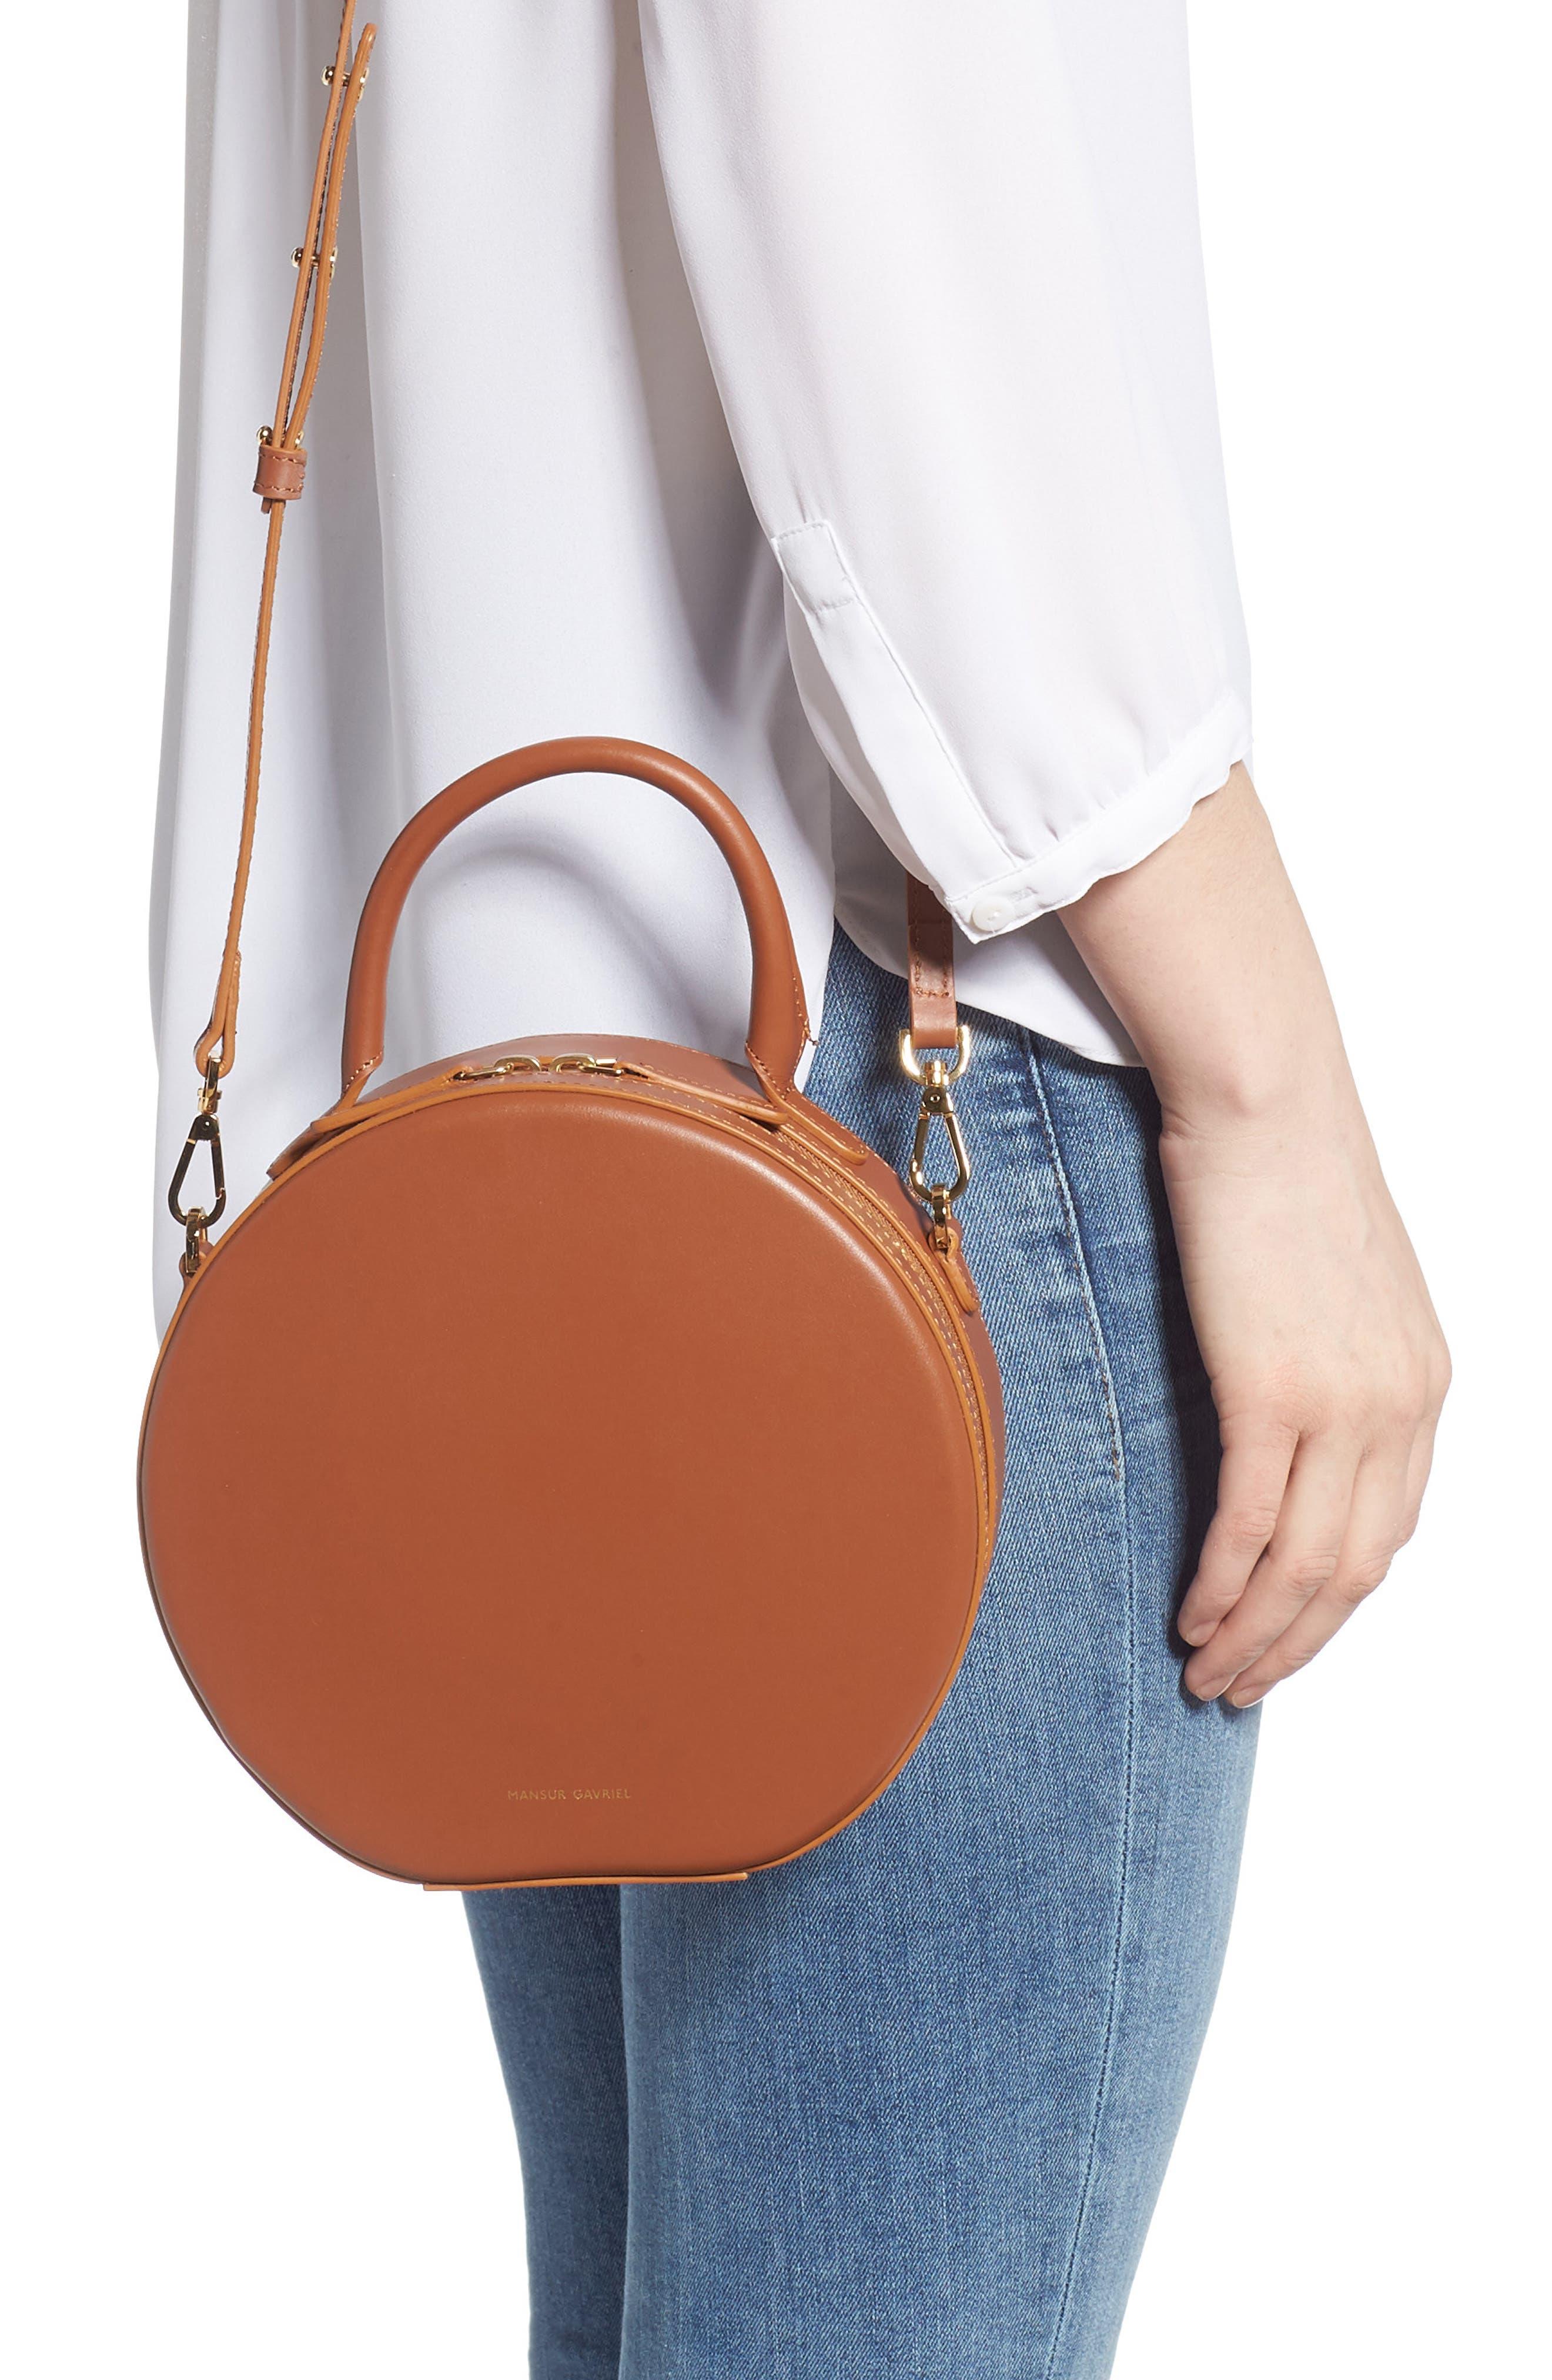 Leather Circle Crossbody Bag,                             Alternate thumbnail 2, color,                             SADDLE